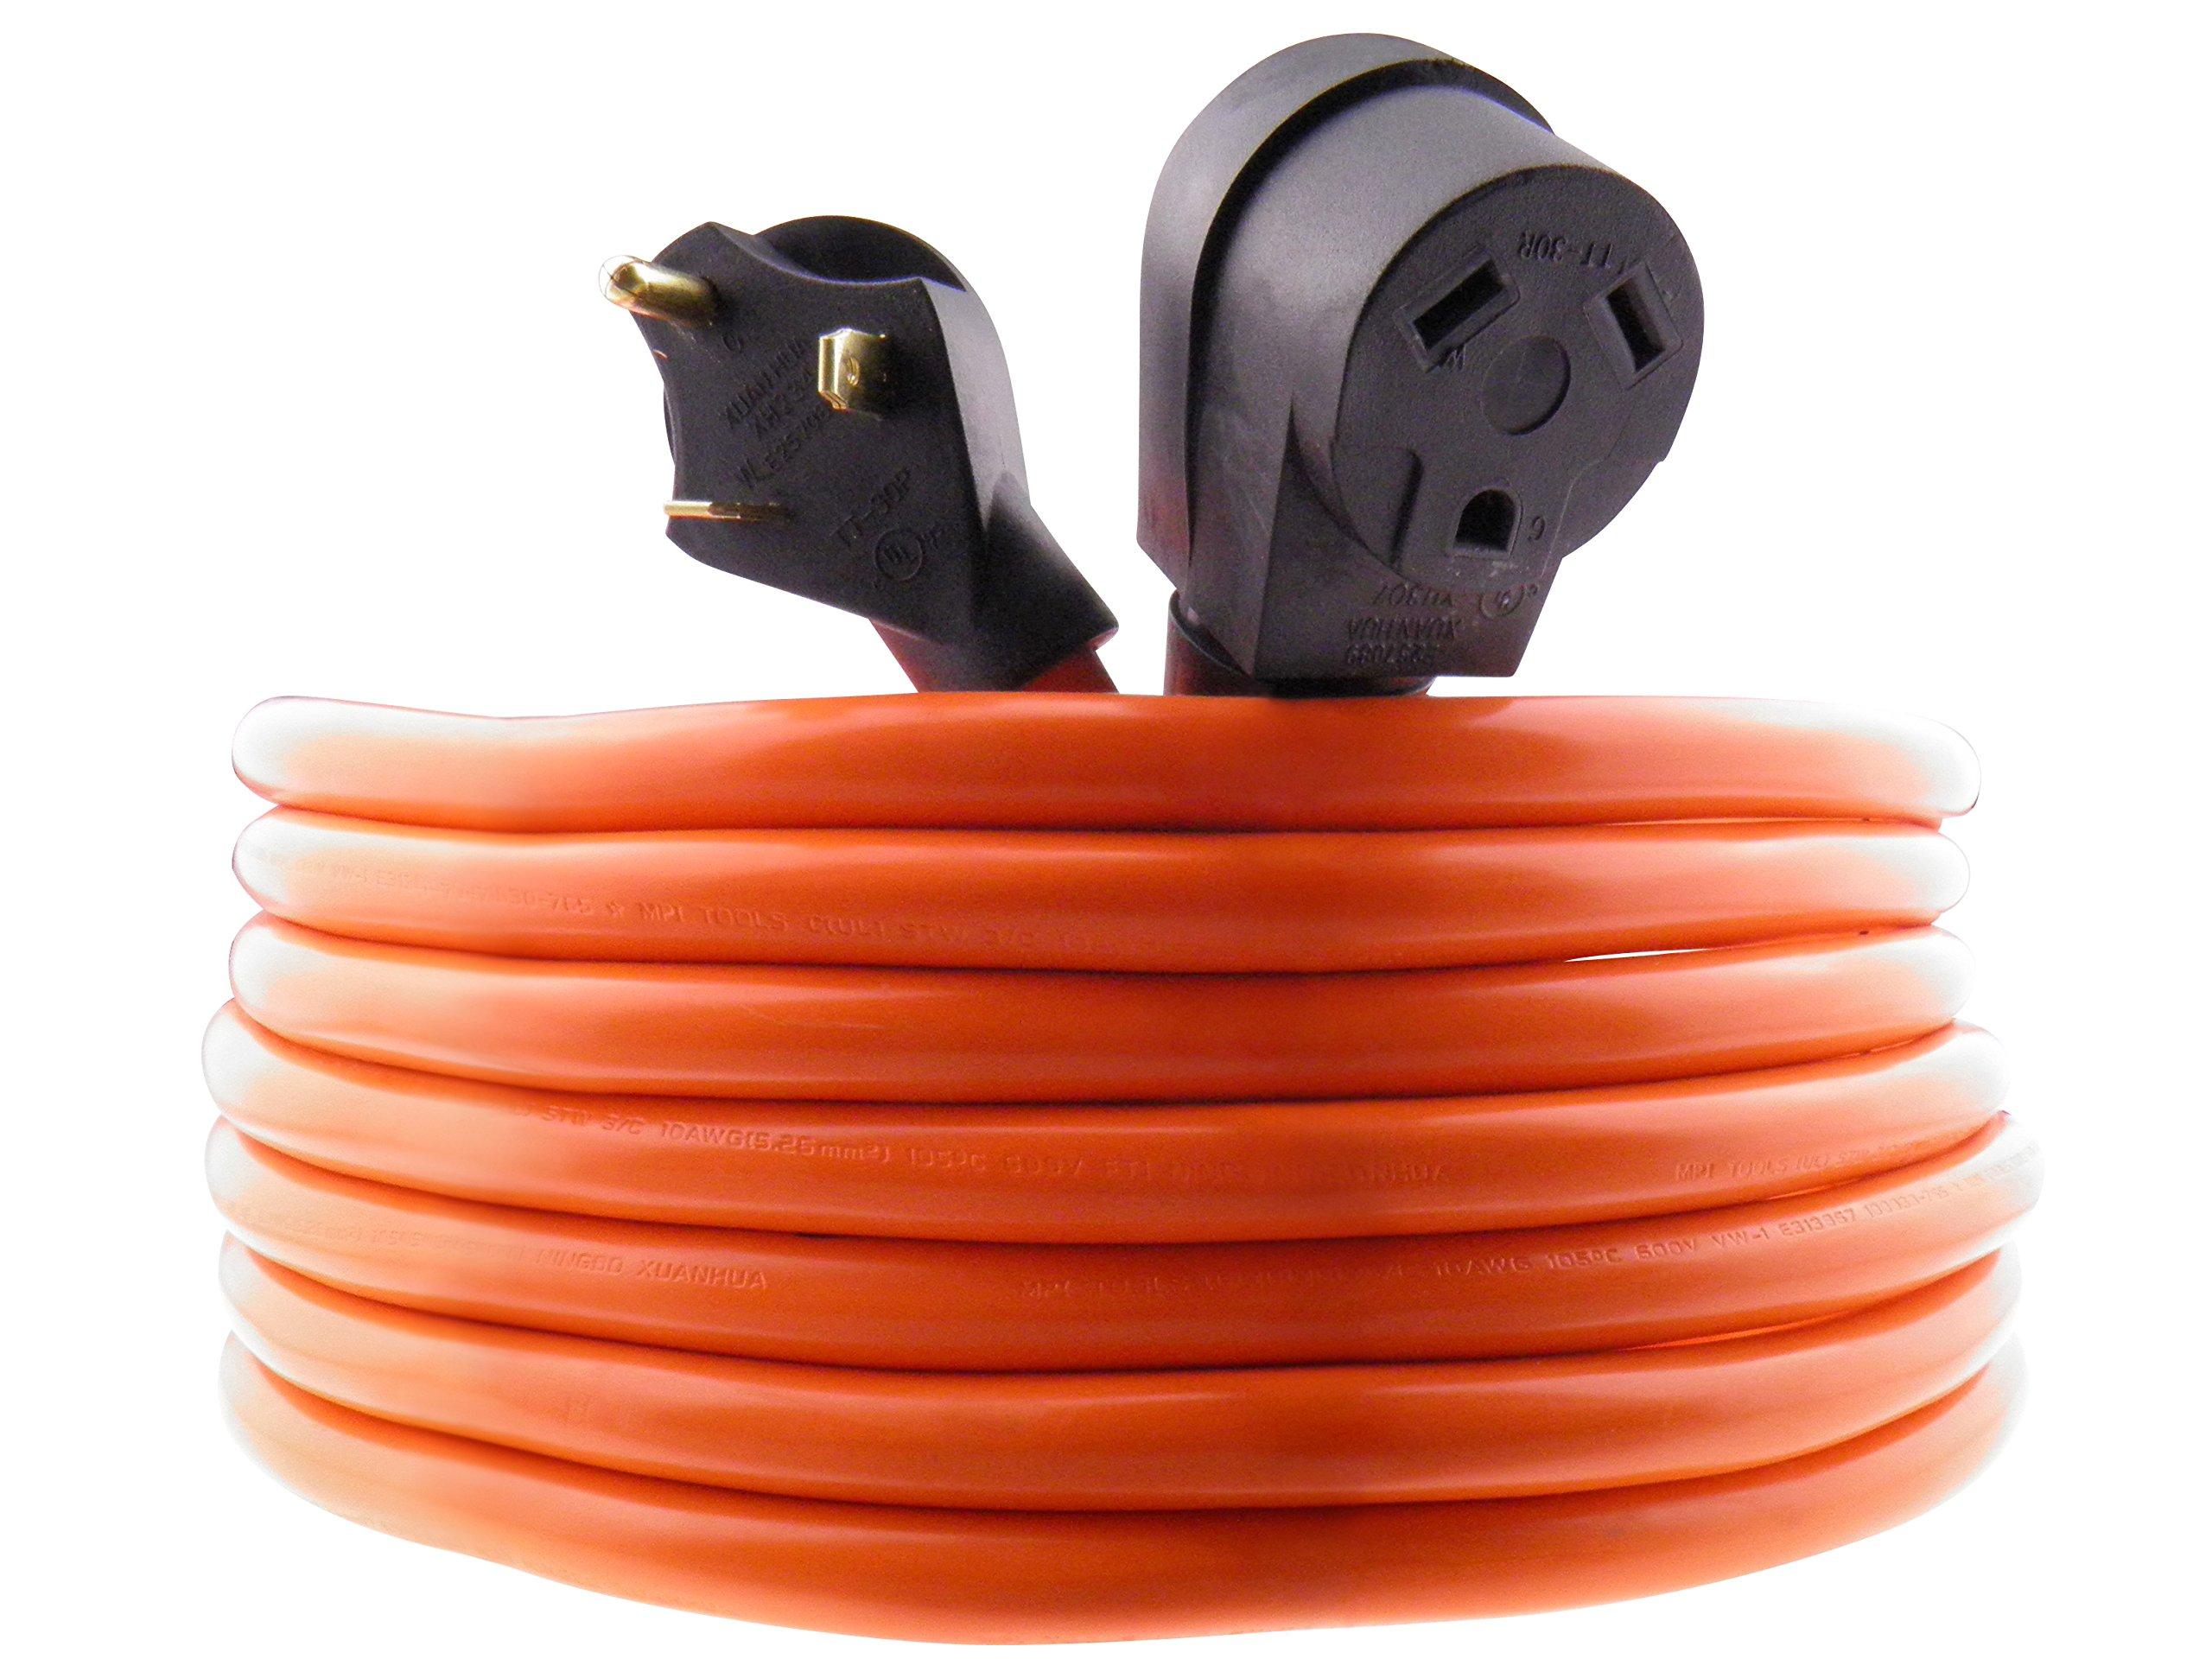 MPI Tools TT-30 RV Power Cord 40 feet 3 Wire 10 Gauge 125volt 30 Amp 7500 watts (40ft)